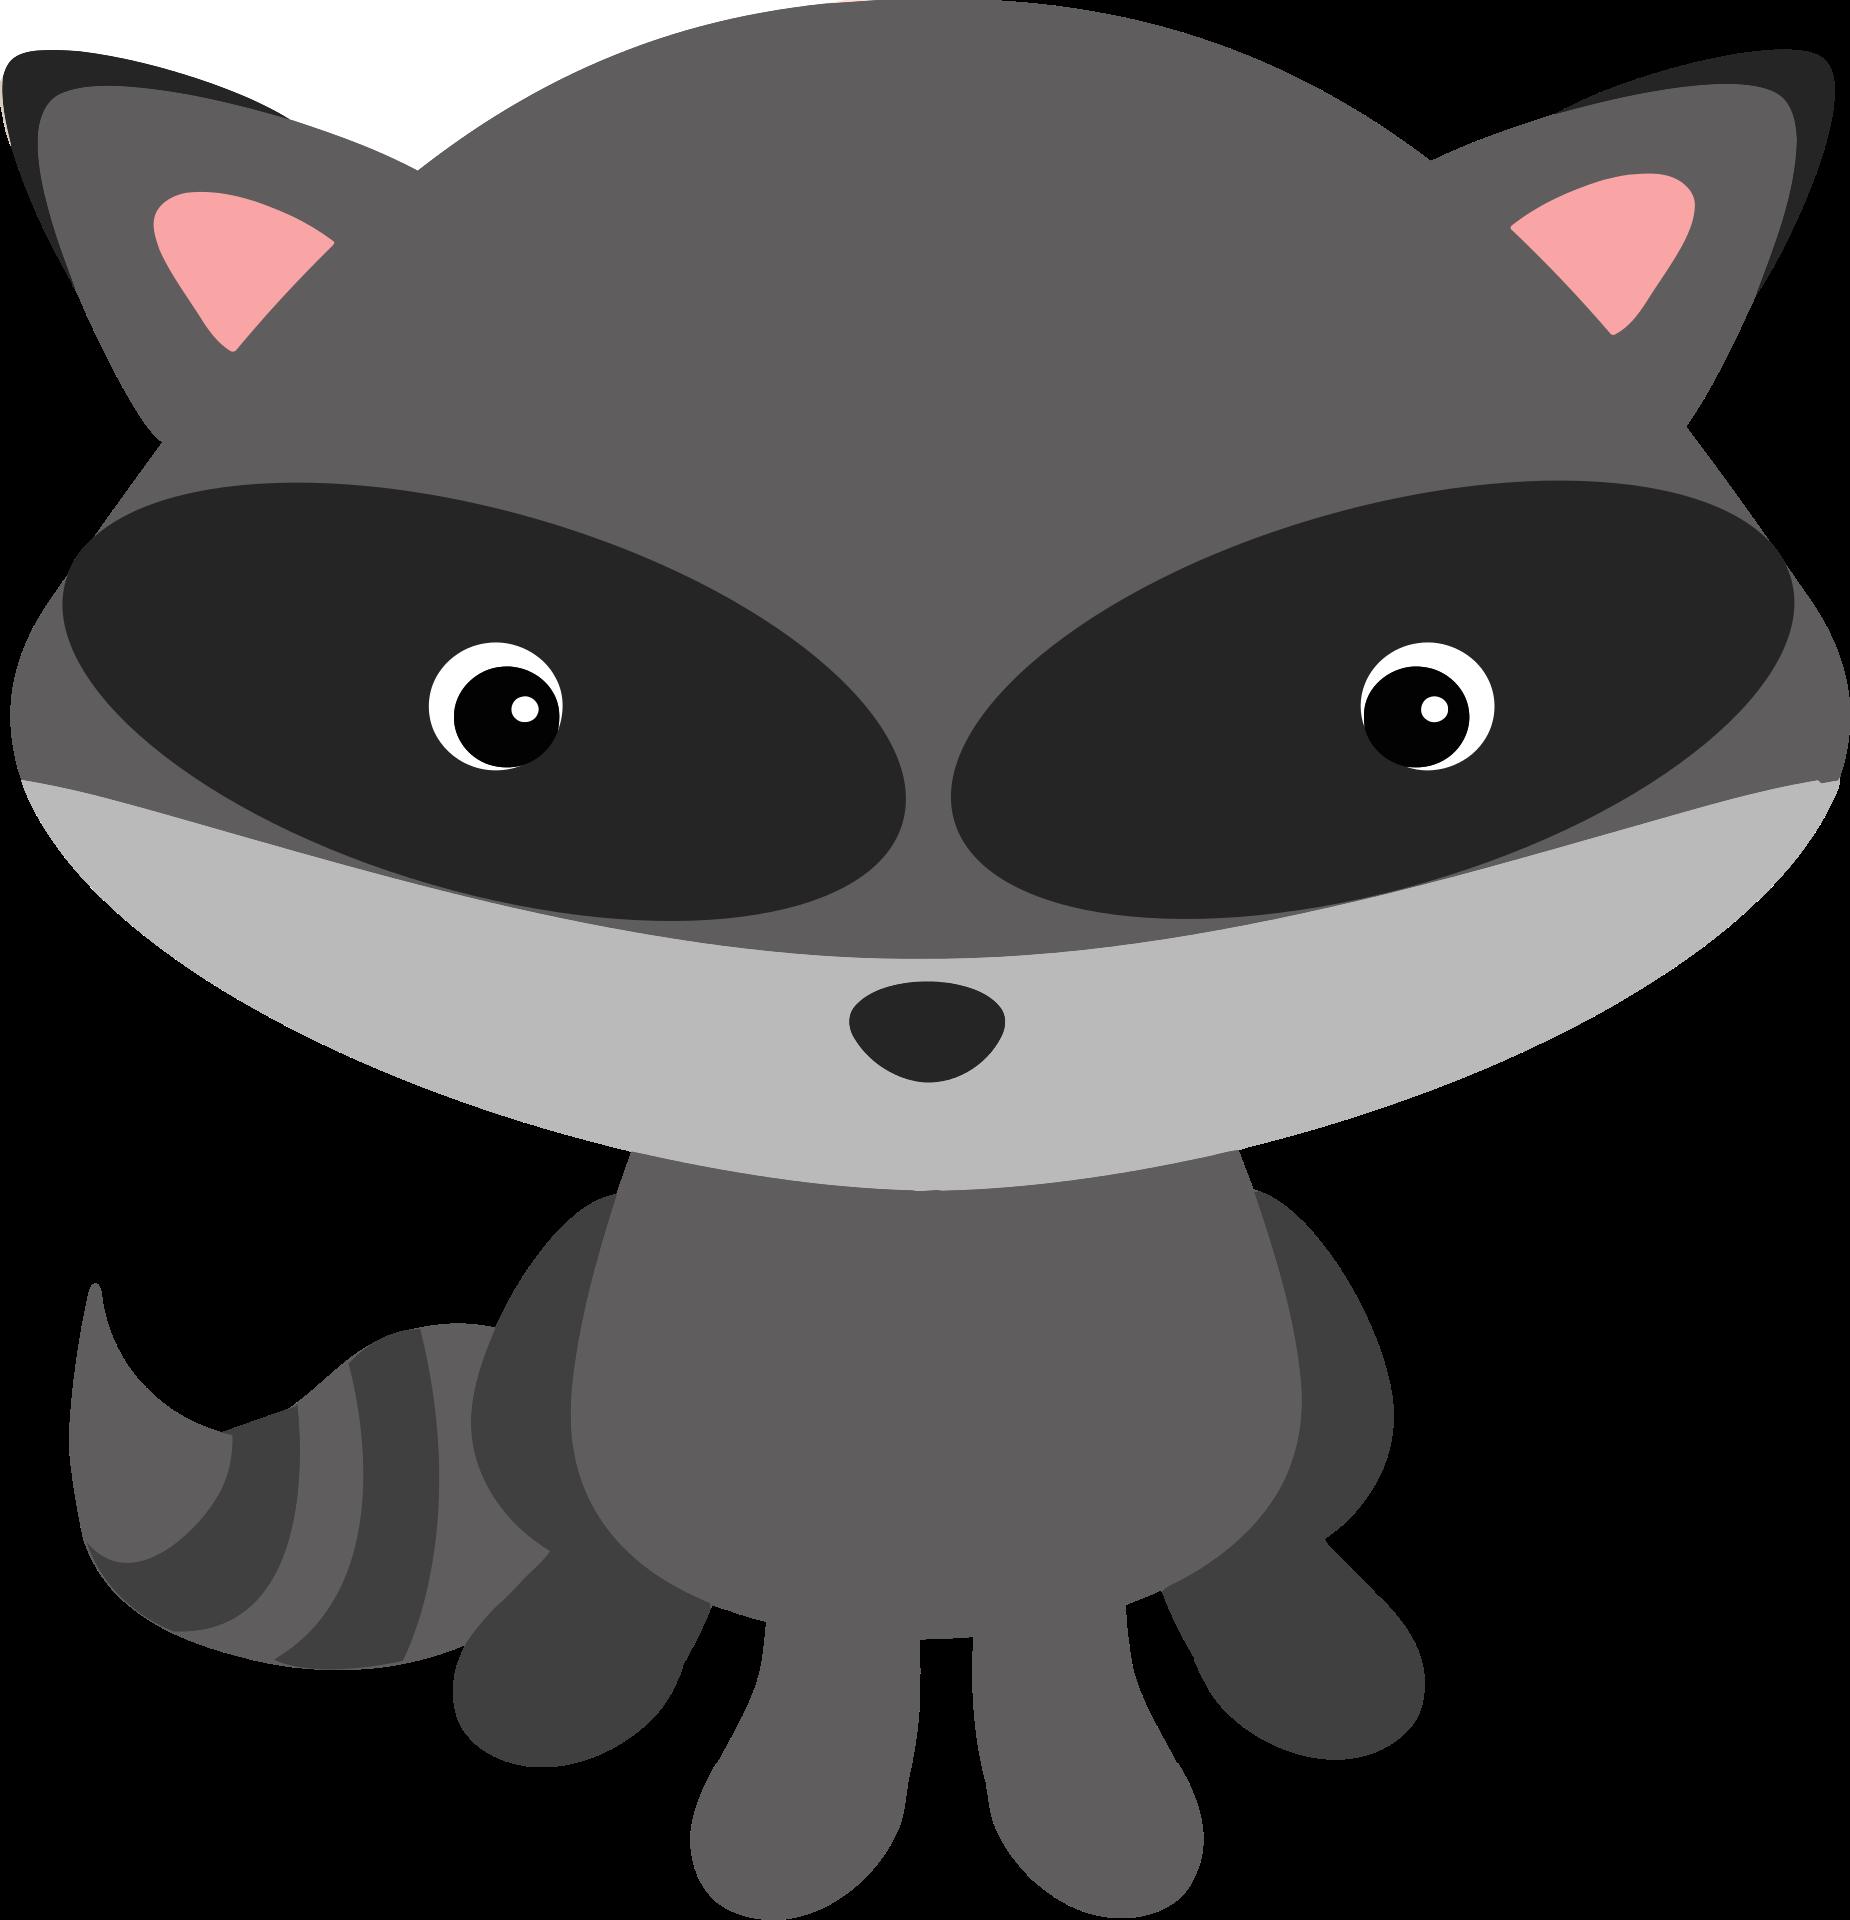 Nut clipart woodland. Raccoon t shirt animal